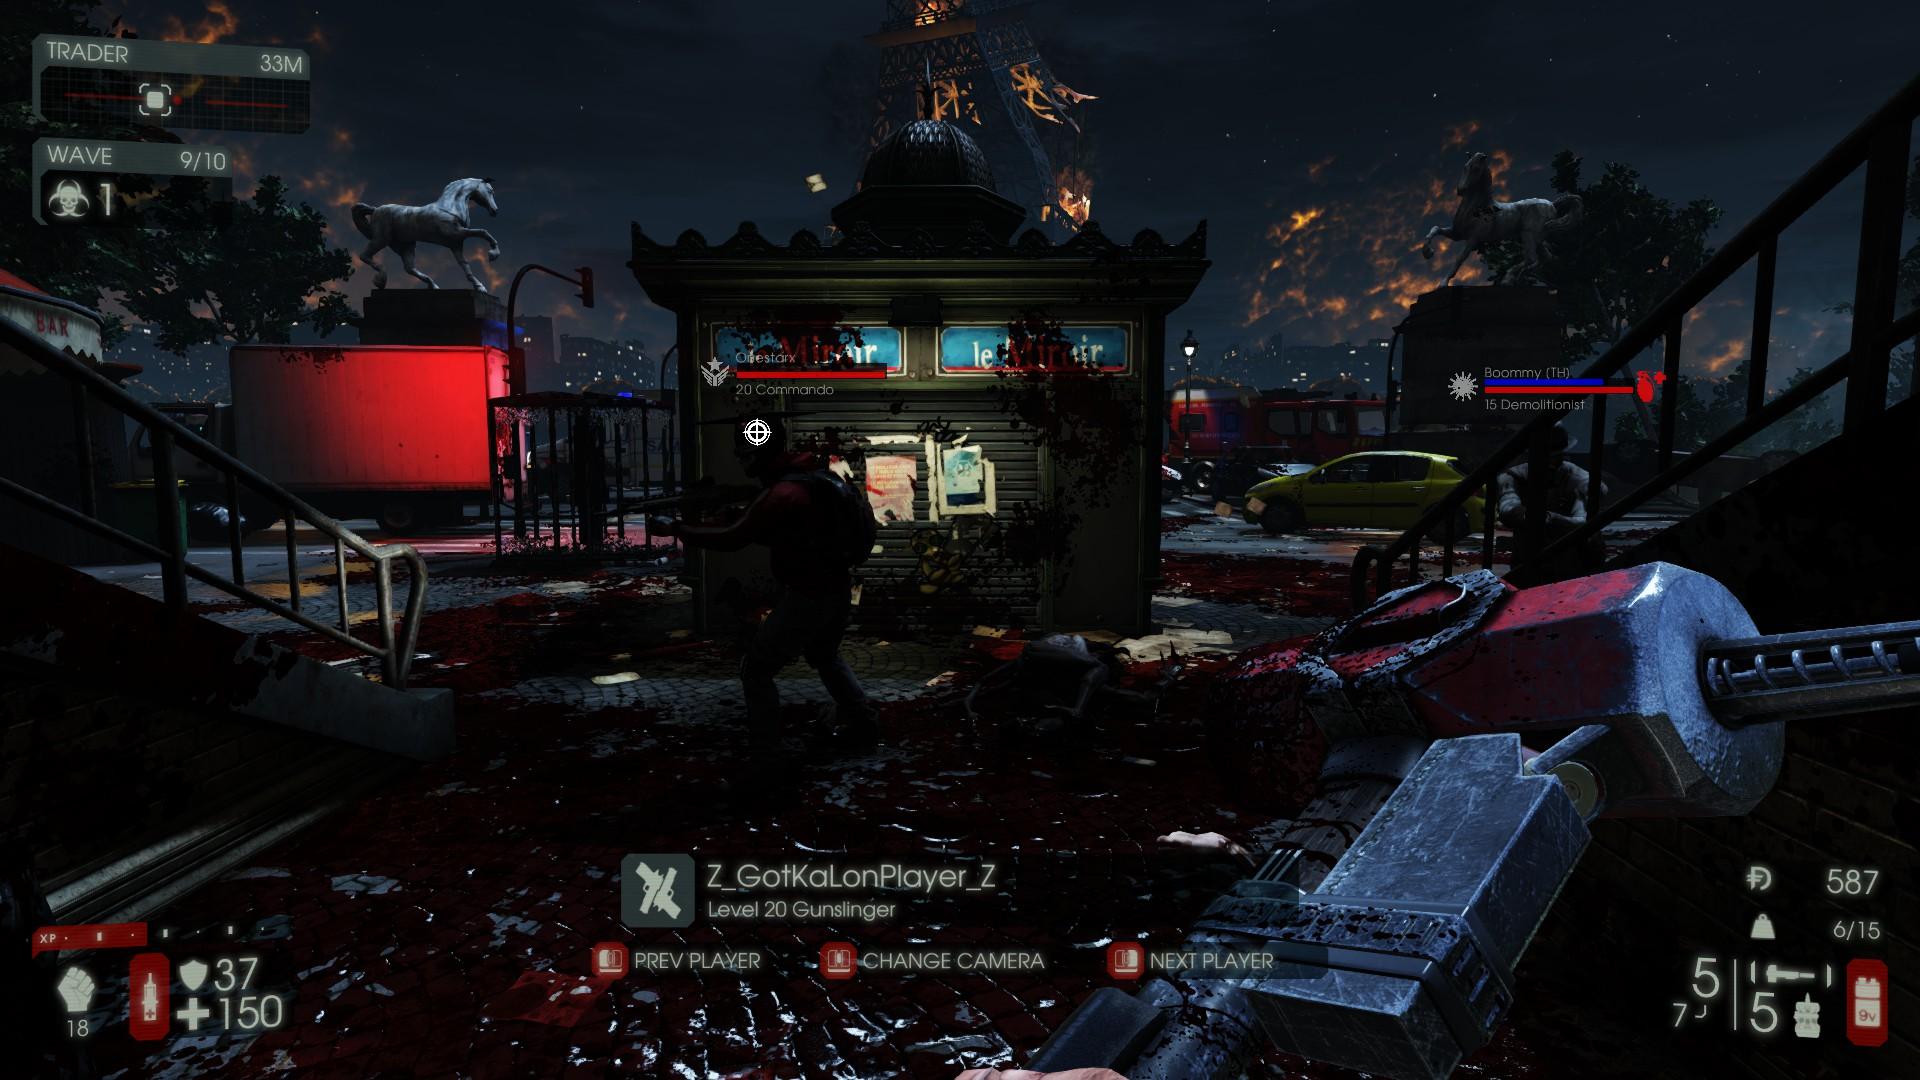 Steam Community Screenshot One Night In Parisnoit Is The